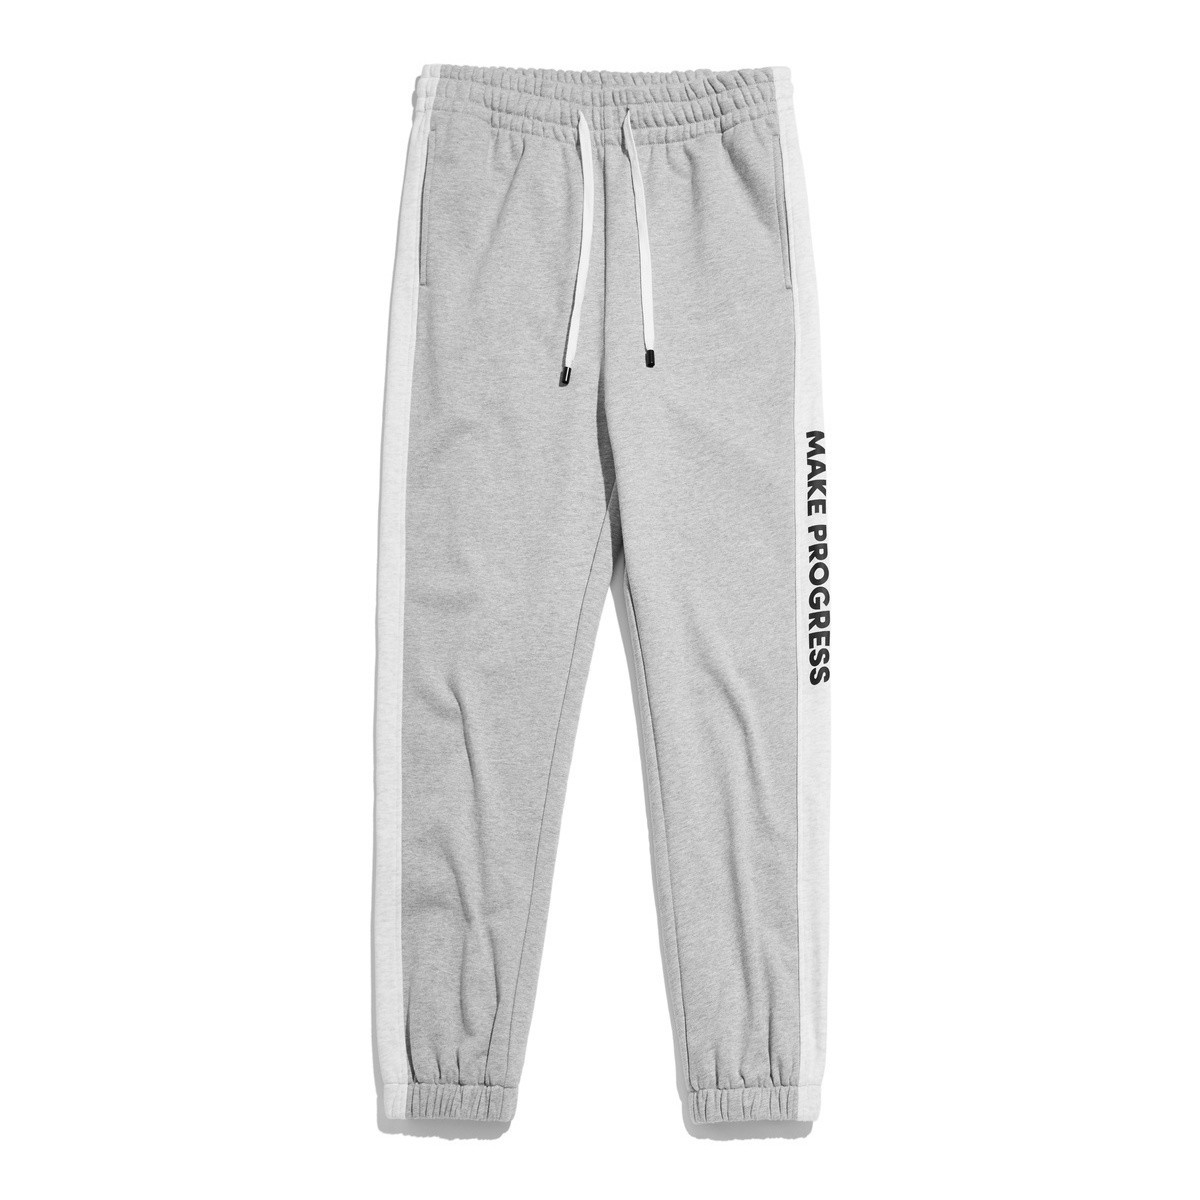 gxg.jeans2019秋新款男士束脚裤针织休闲裤男裤子JY102160A002